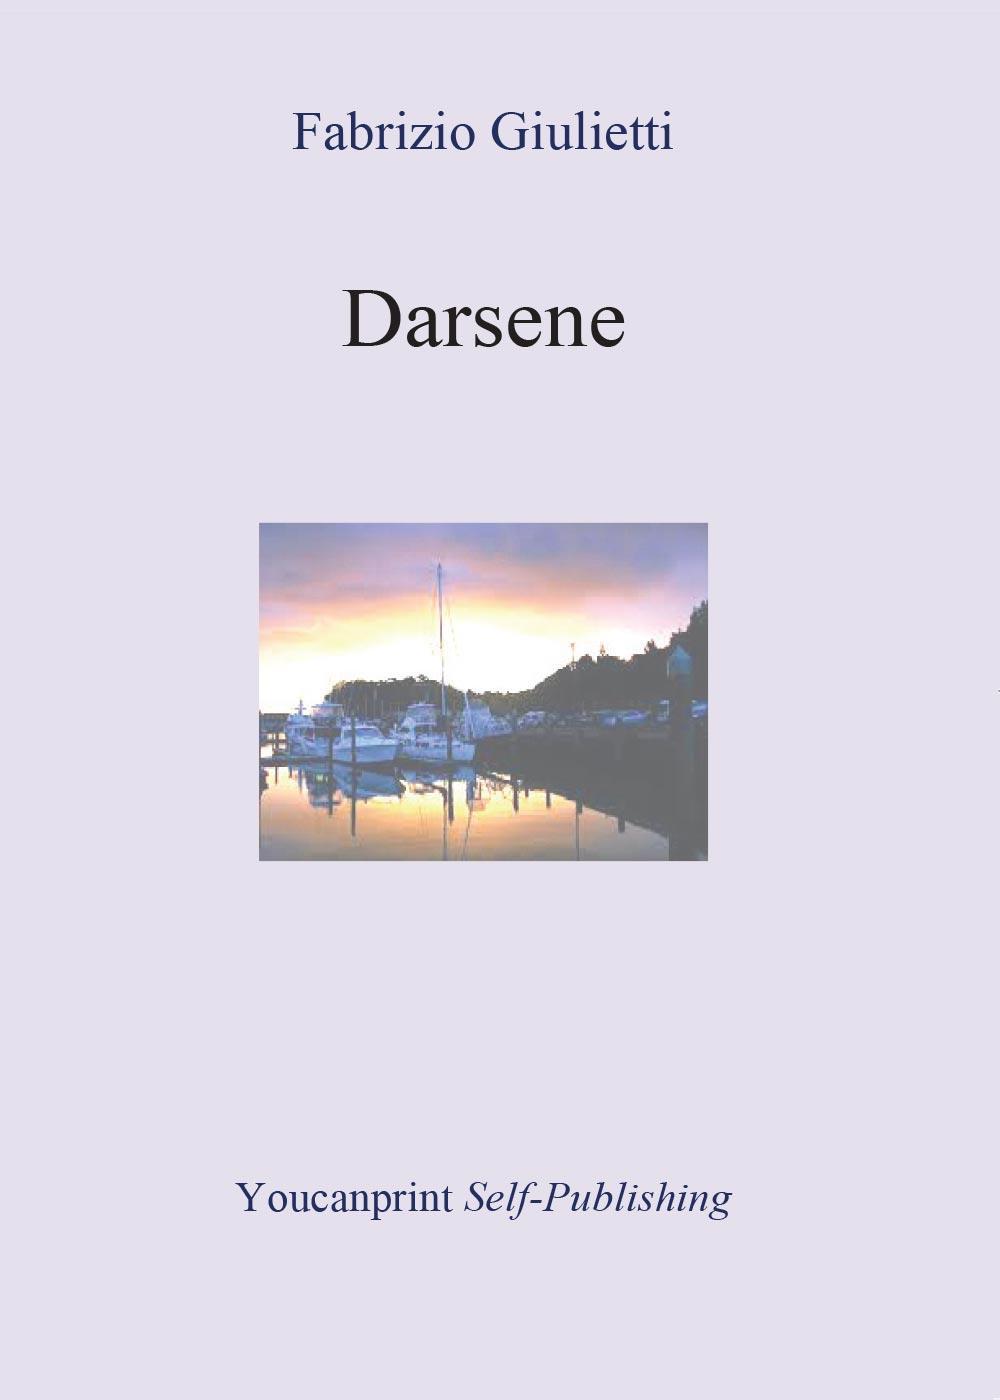 Darsene